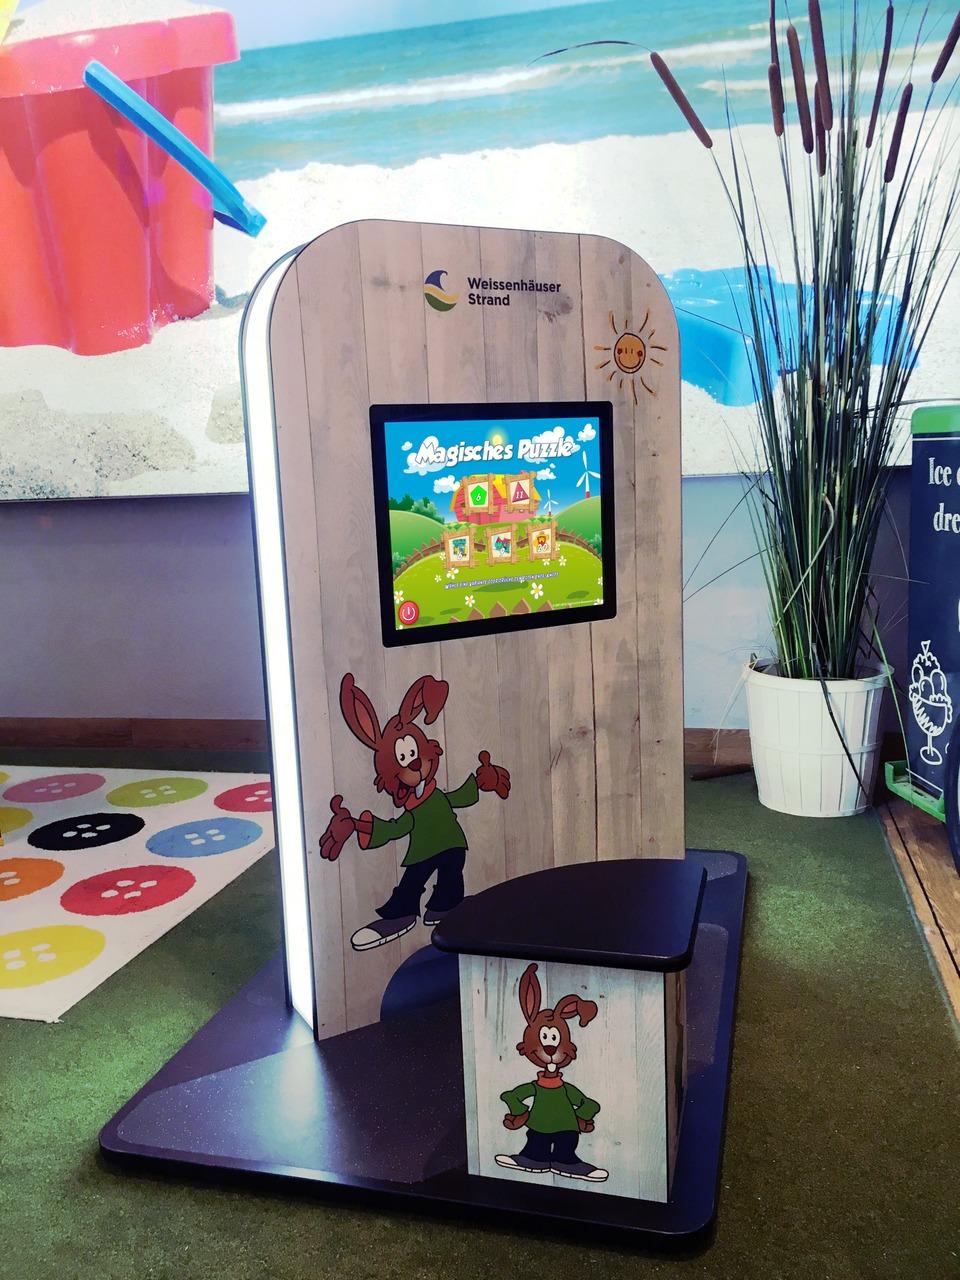 MyKidsCorner Deluxe 2 x Touchscreen customized for Weissenhäuser Strand